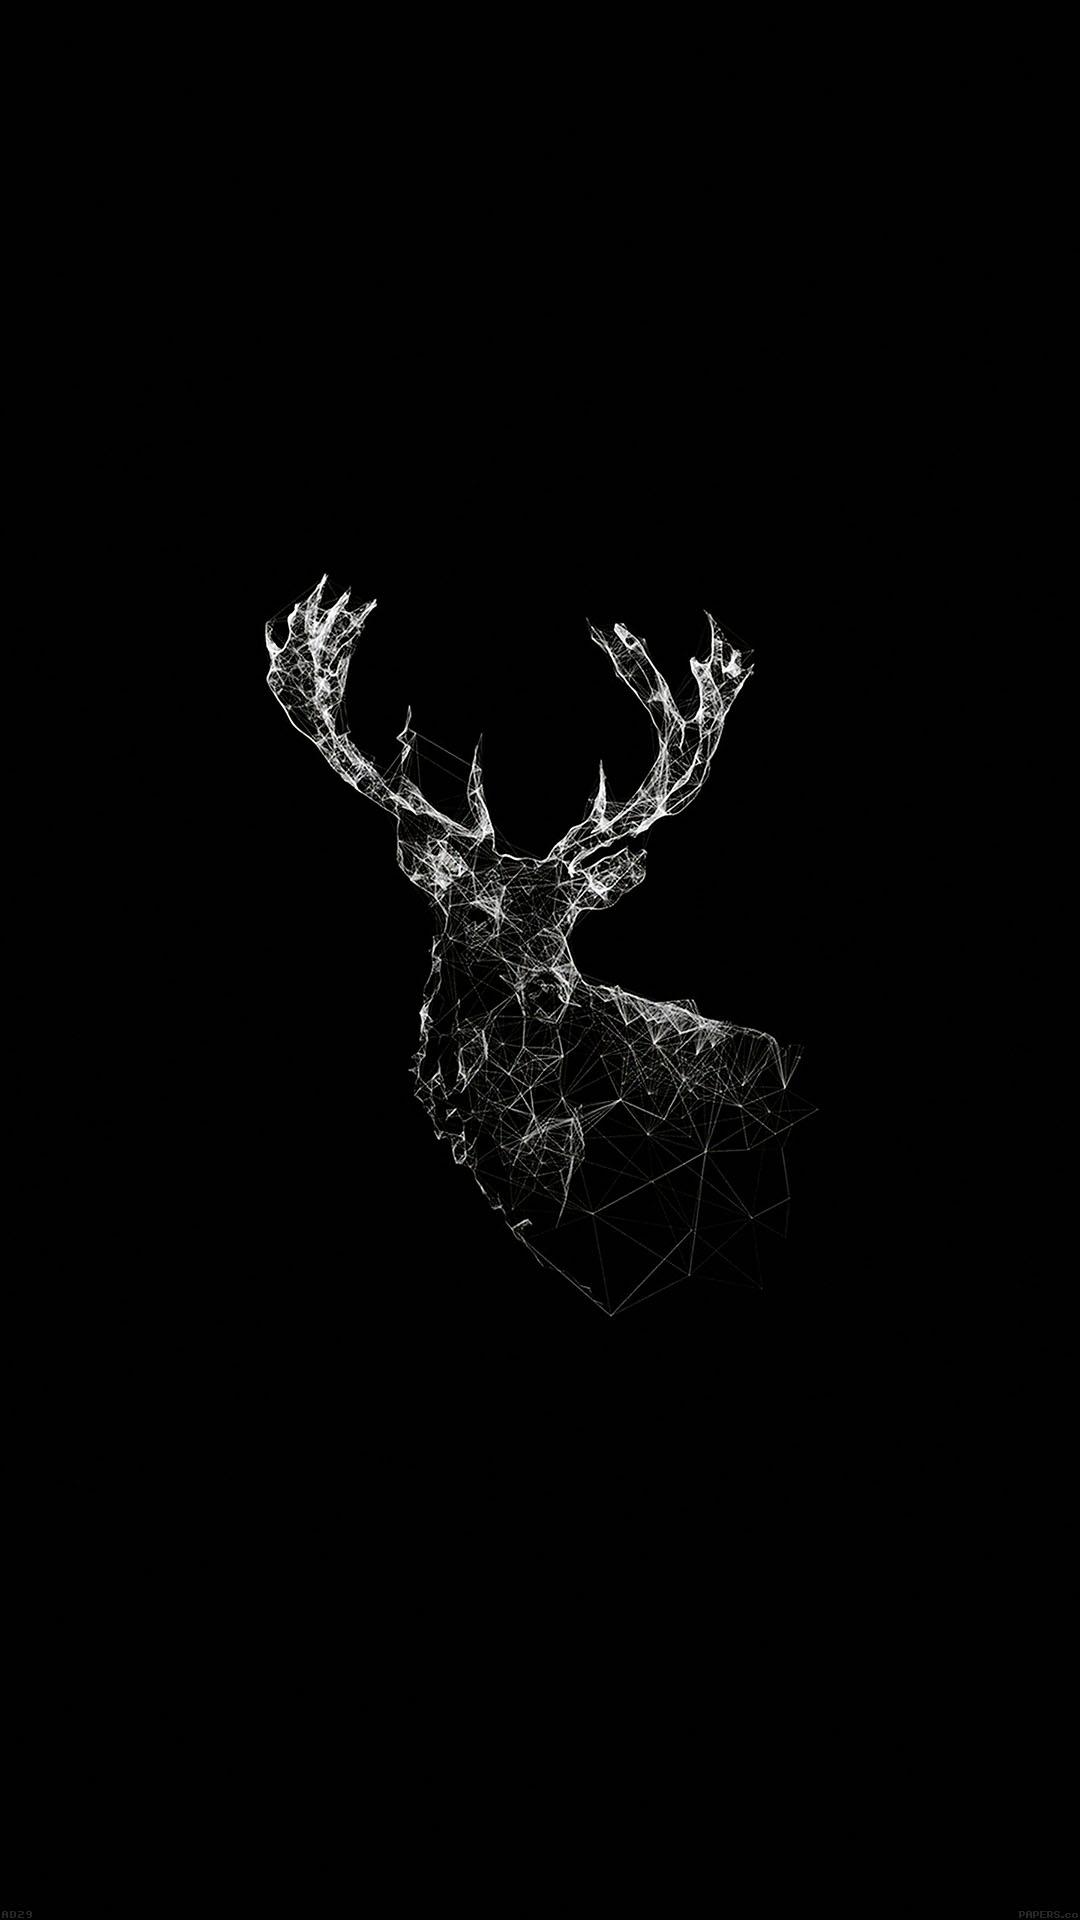 Deer animal illust dark android wallpaper android hd wallpapers - Hunting wallpaper for android ...